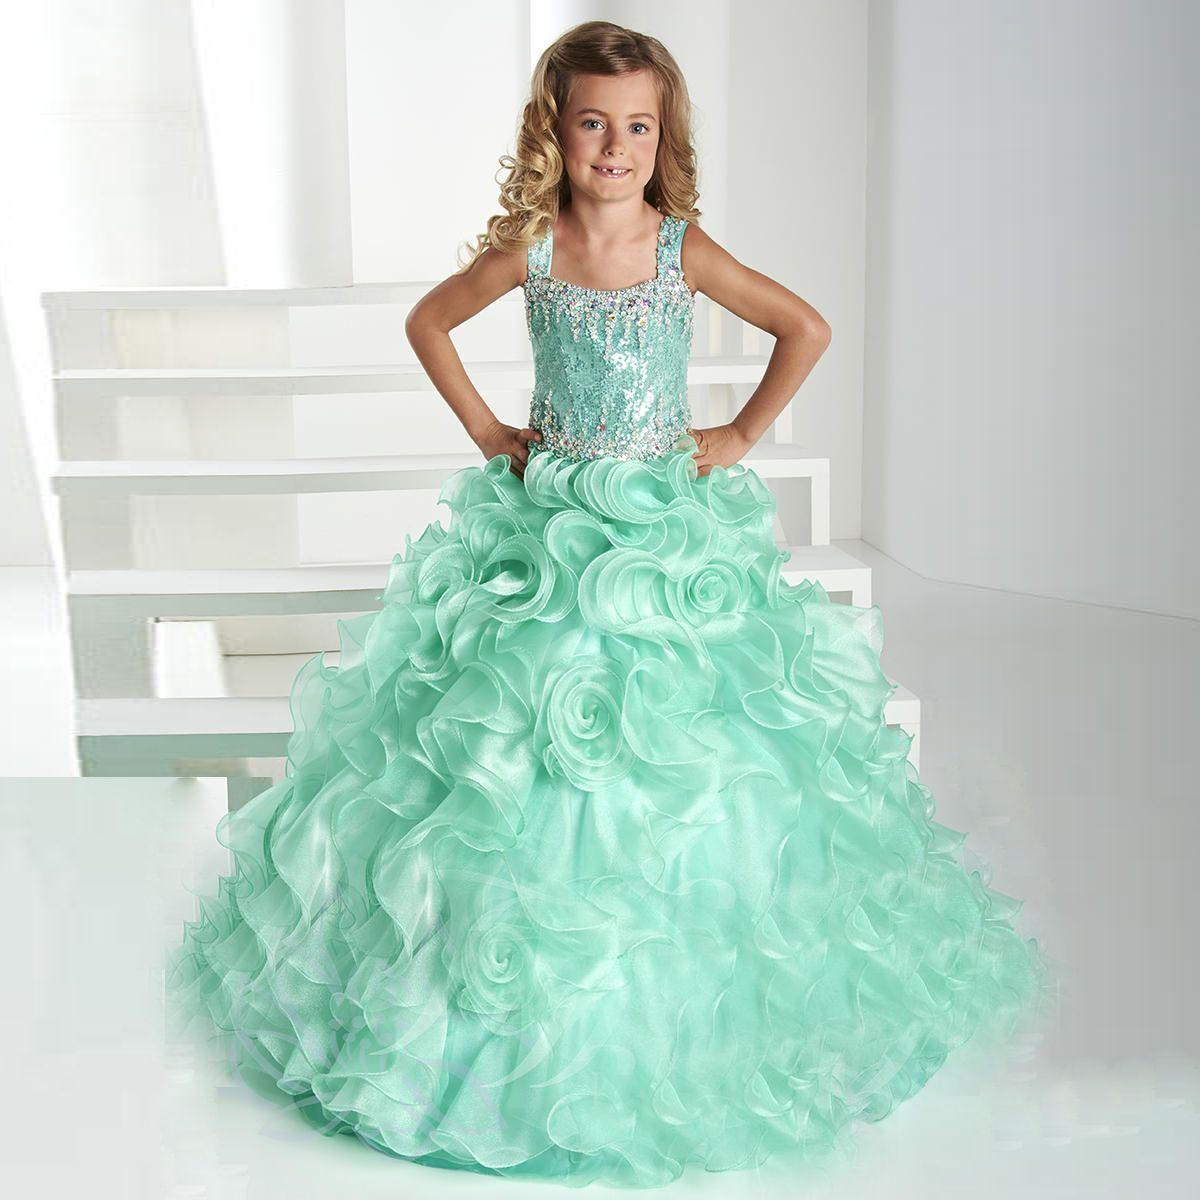 Ruffles Ball Gown Girls Pageant Dresses Spaghetti Straps Kids ...